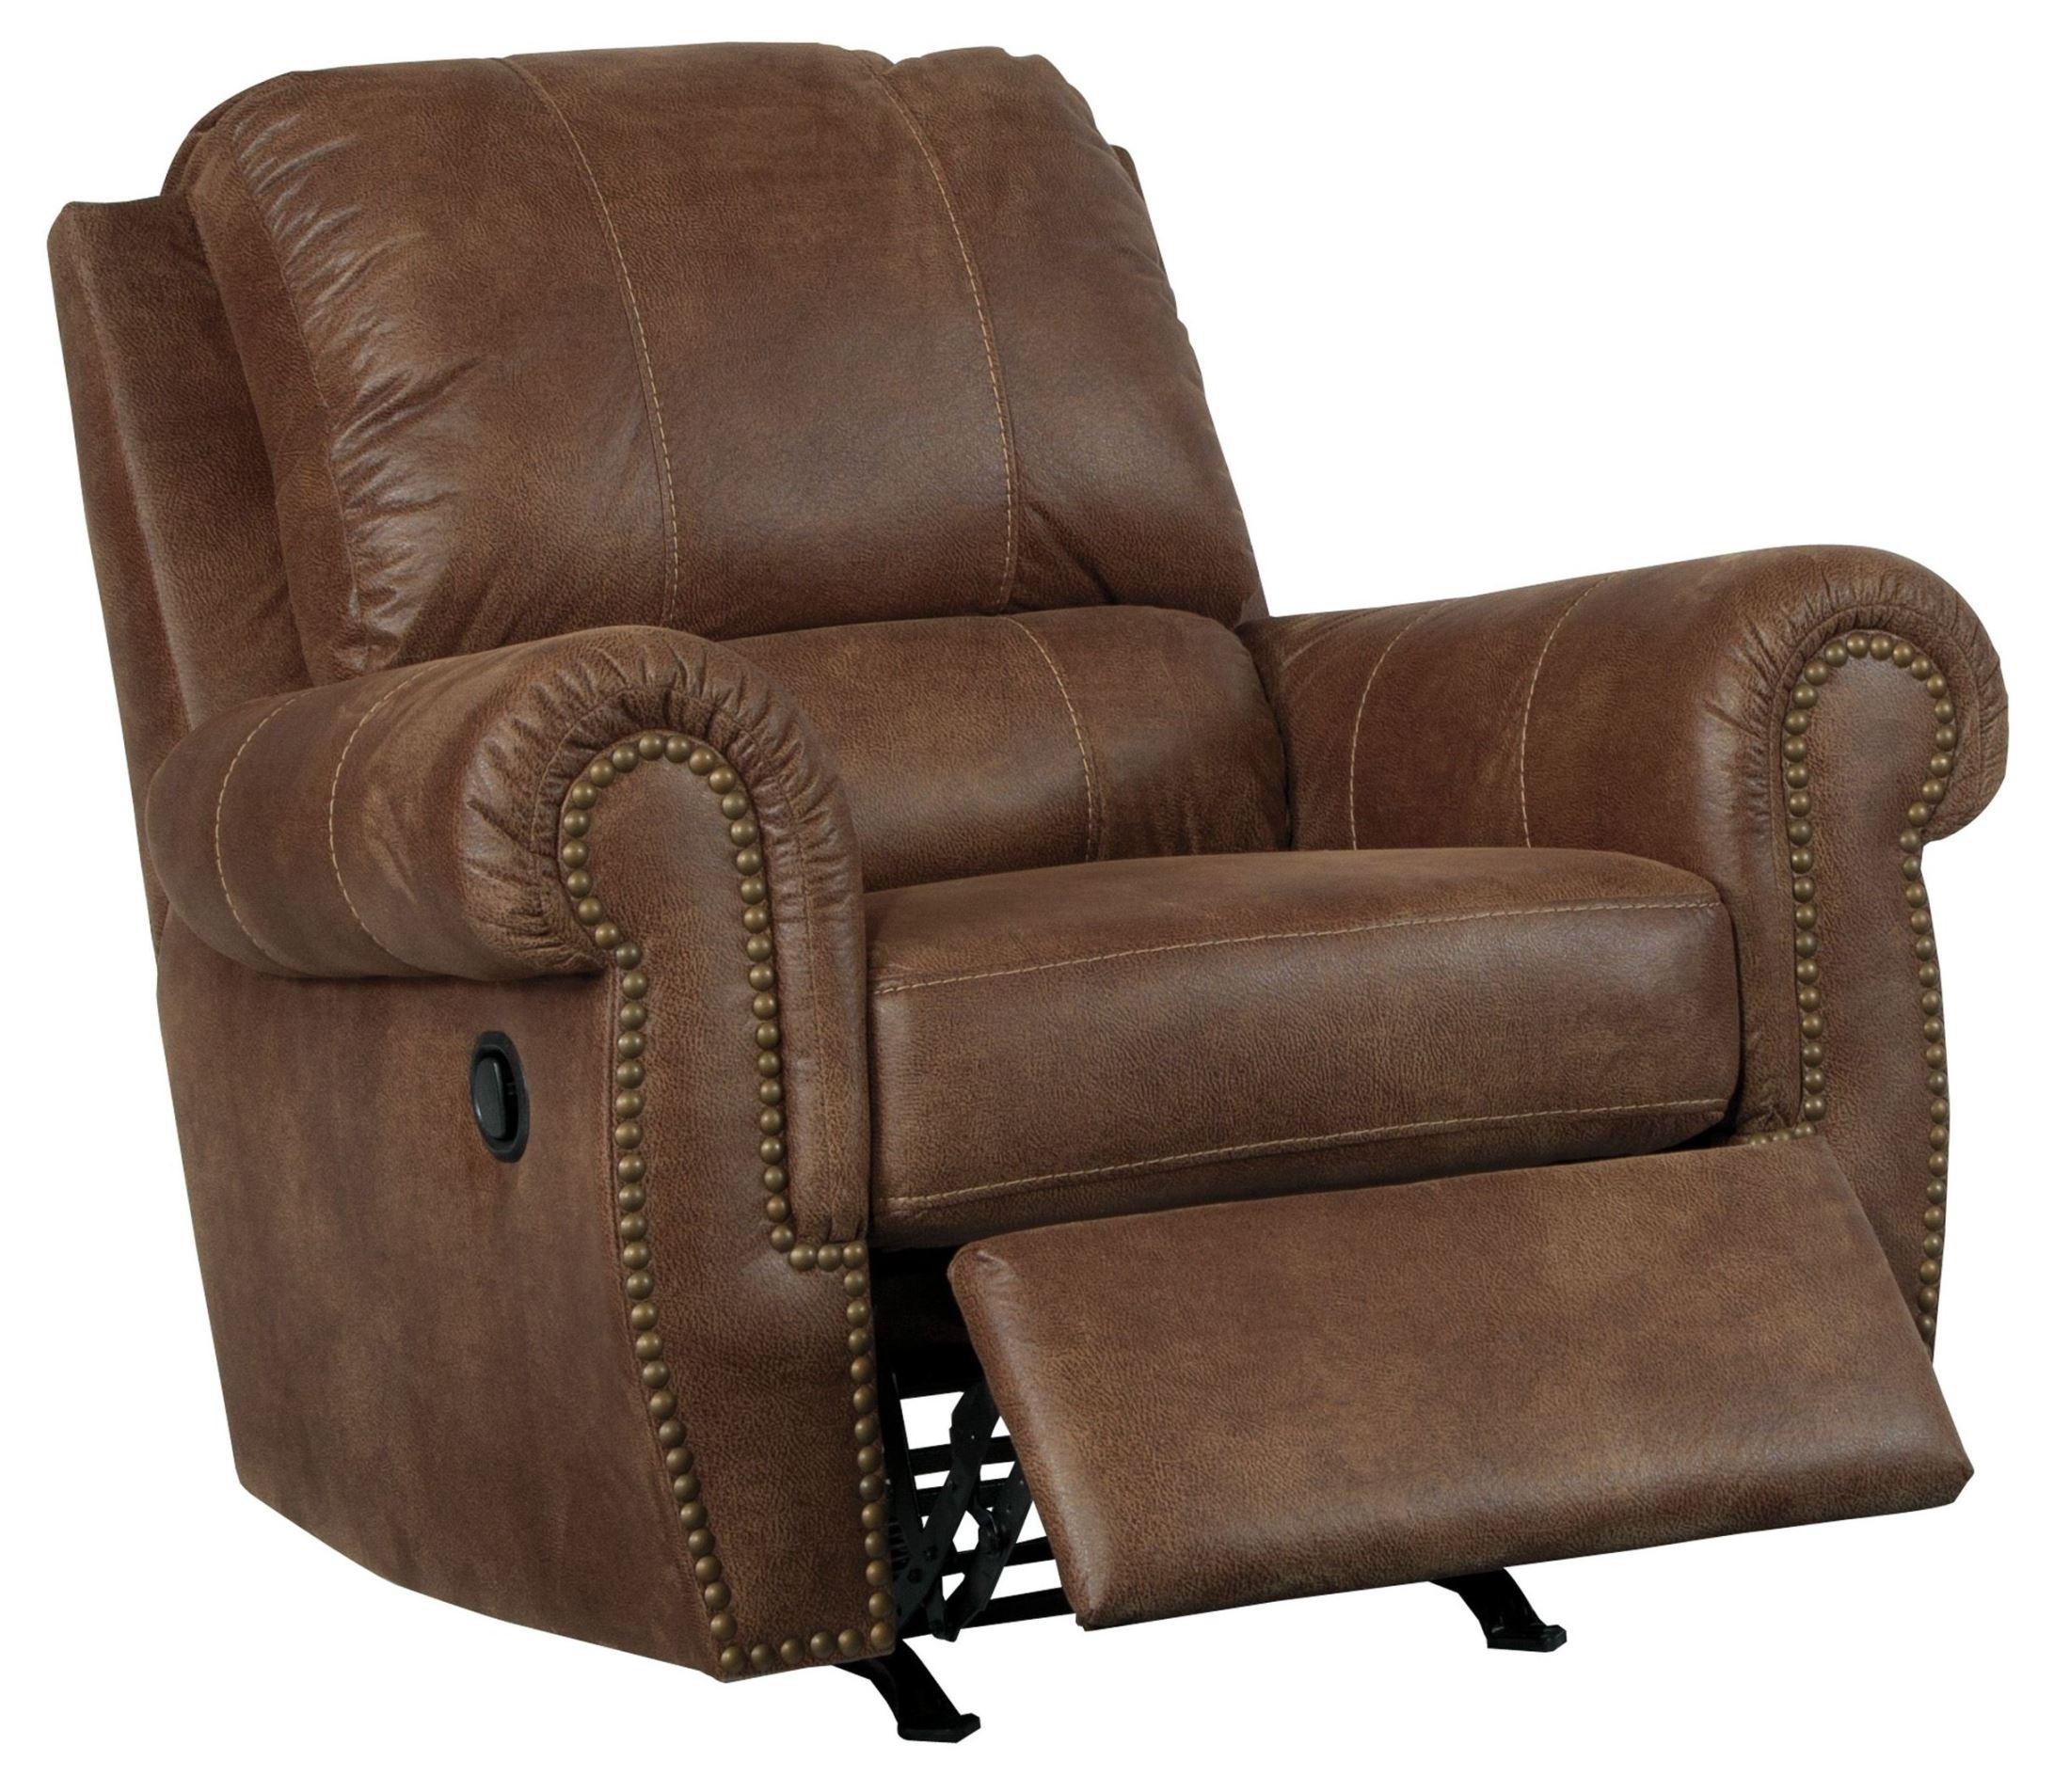 Burnsville Espresso Rocker Recliner From Ashley 9720625 Coleman Furniture